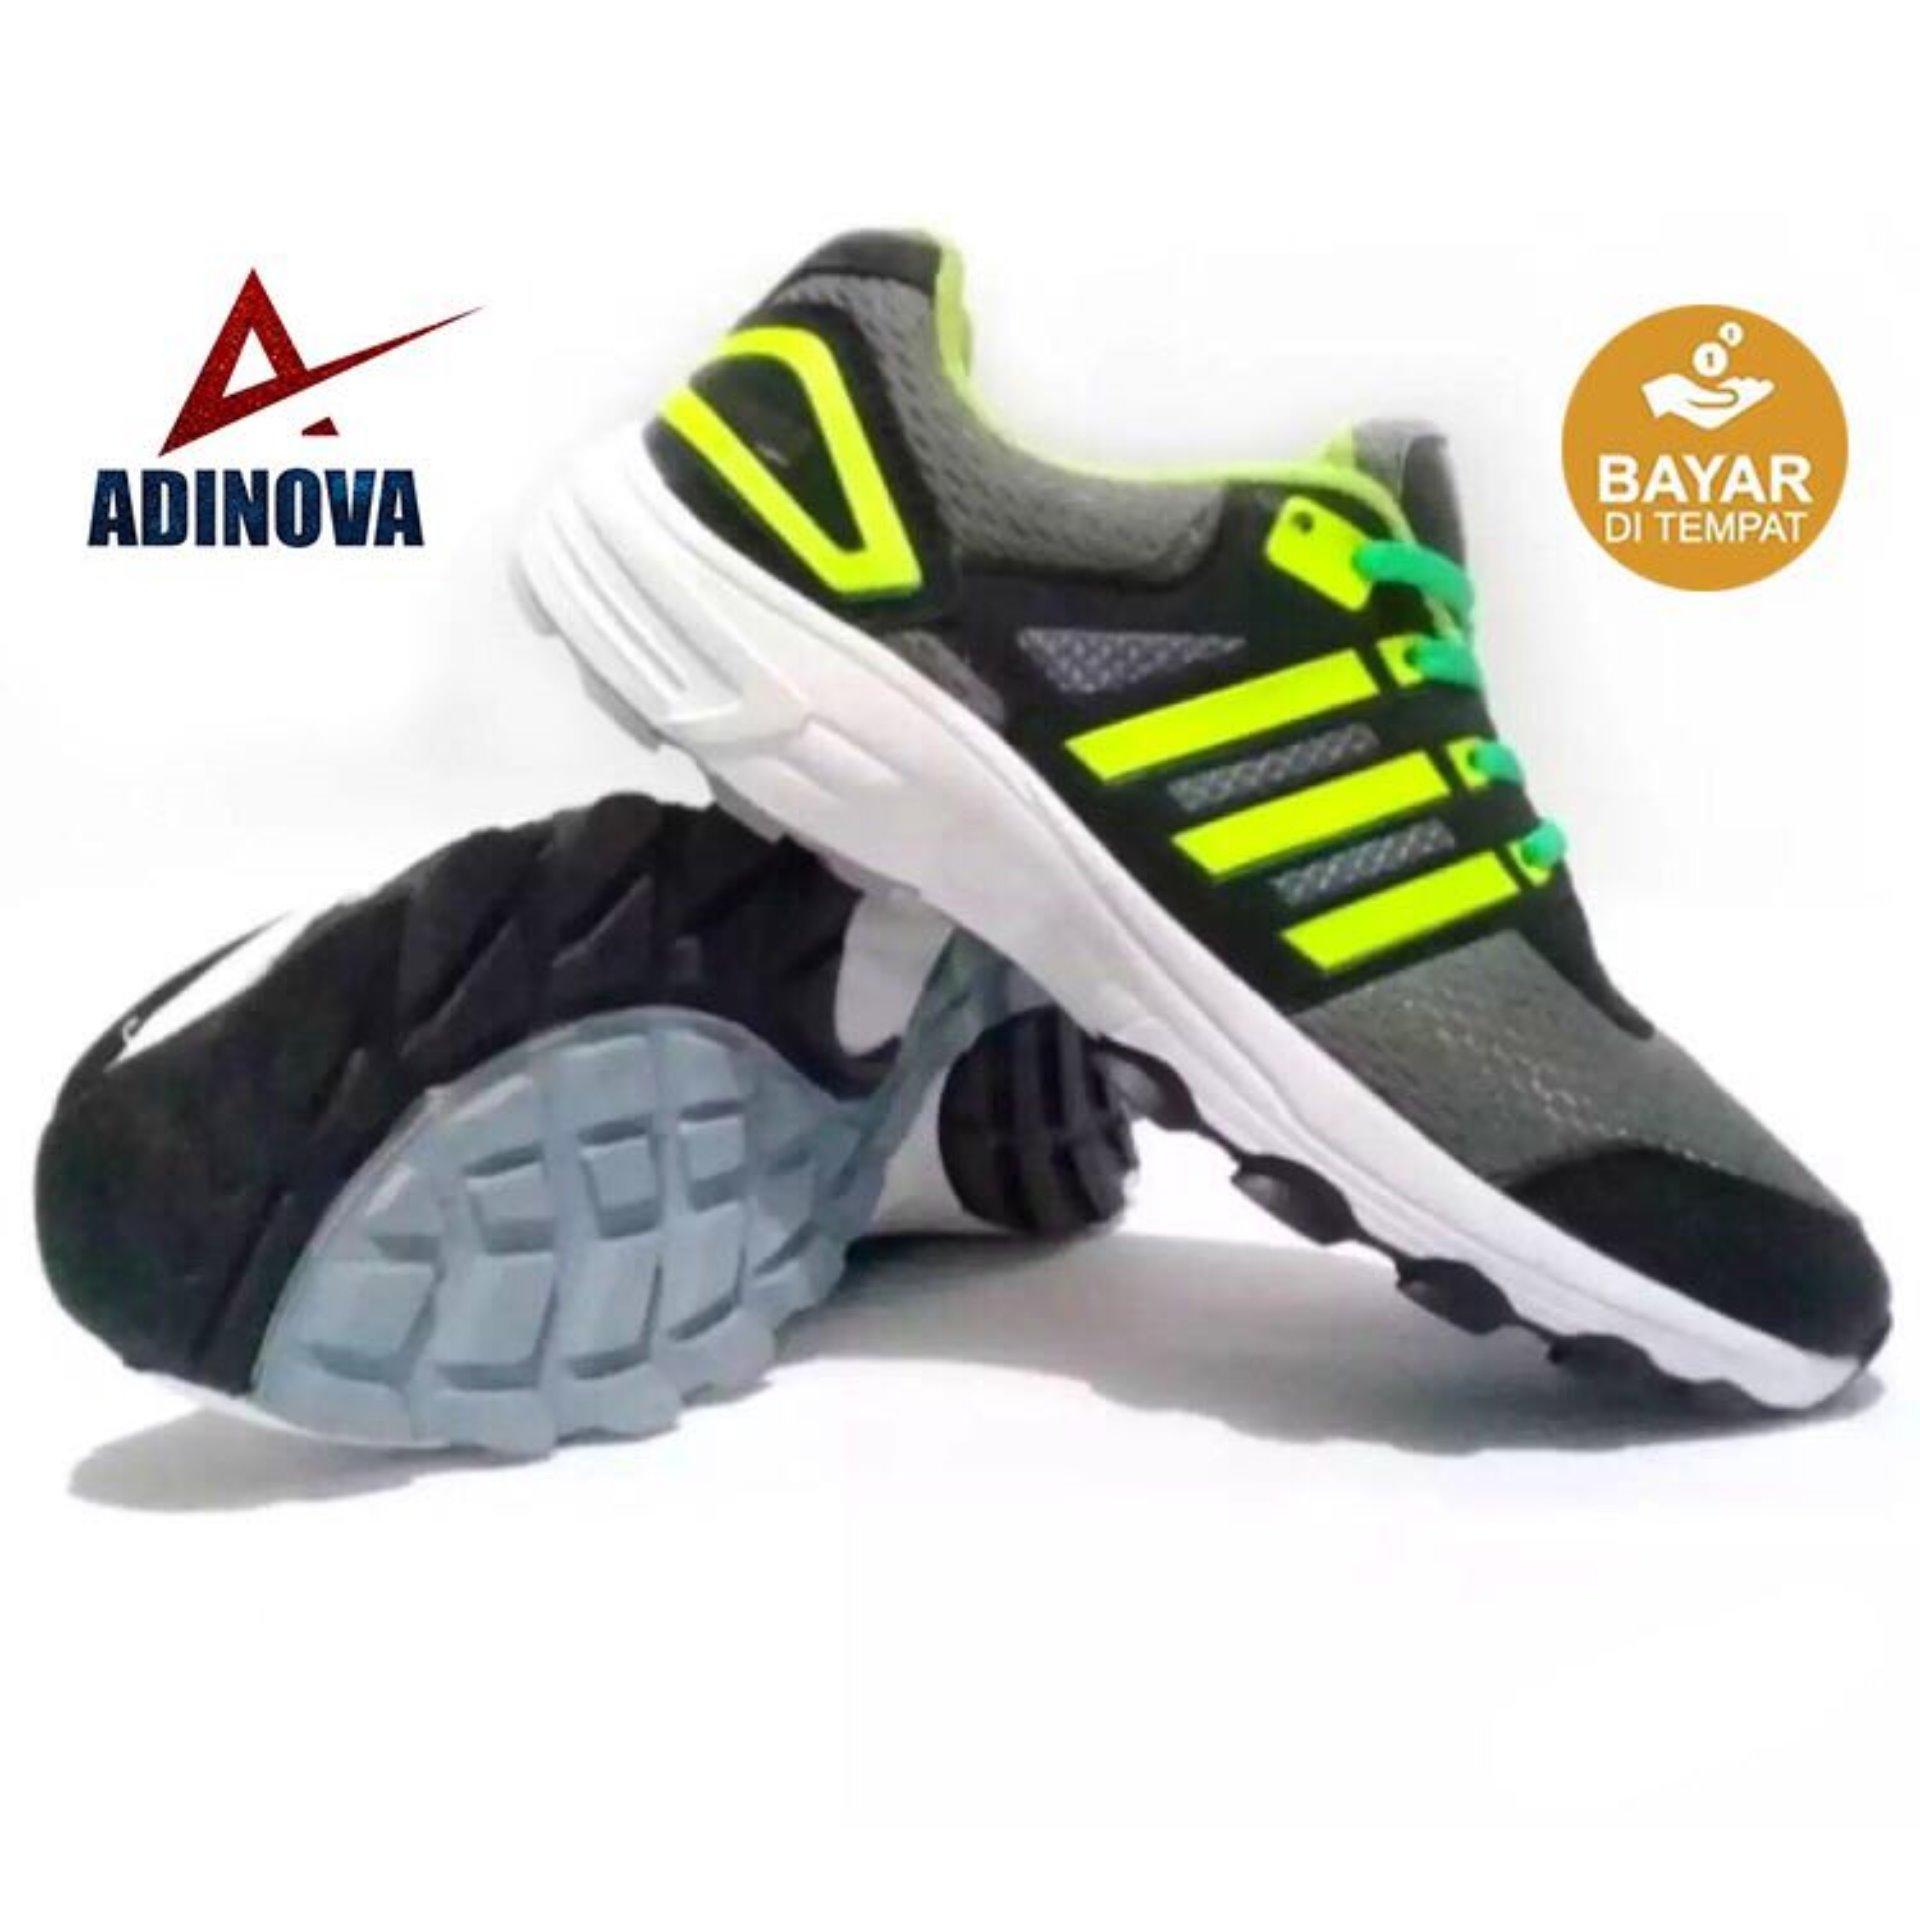 Adinova Shoes Sepatu Sport Pria Sepatu Sneaker Pria   Sepatu Olahraga Sepatu  Lari  89d7edca85